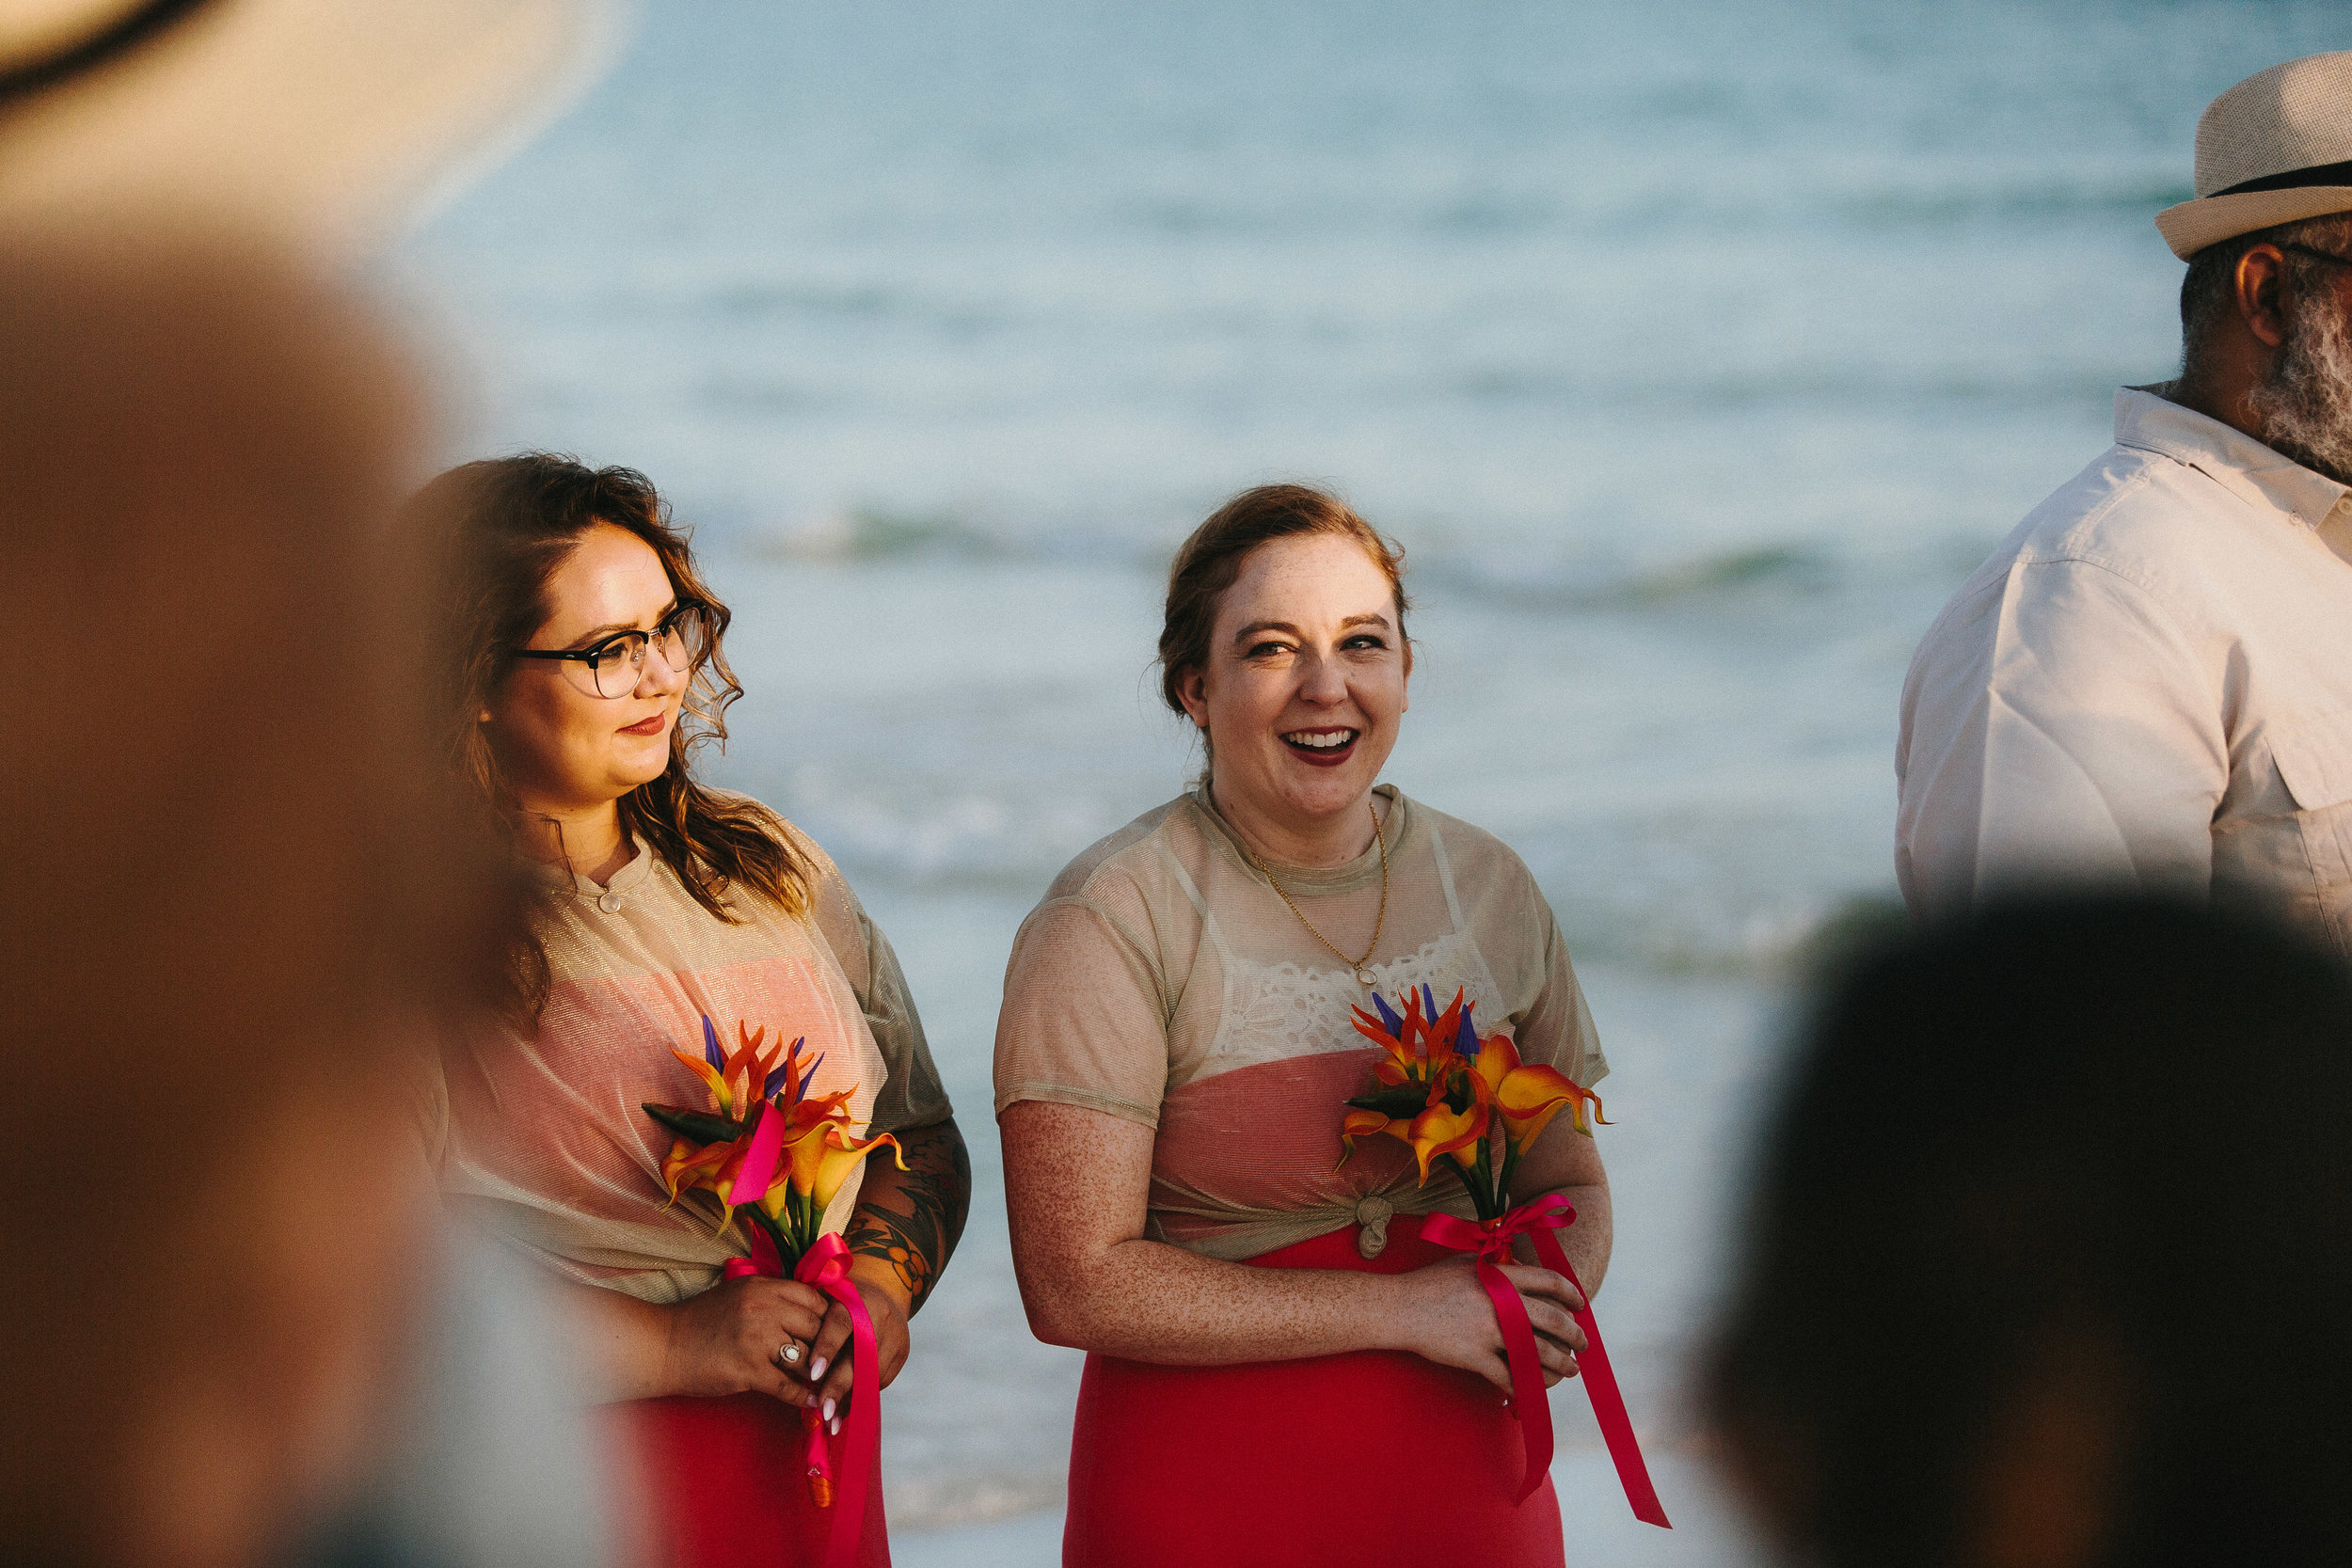 destin_sunset_beach_elopement_intimate_wedding_photographer_florida_documentary_1160.jpg